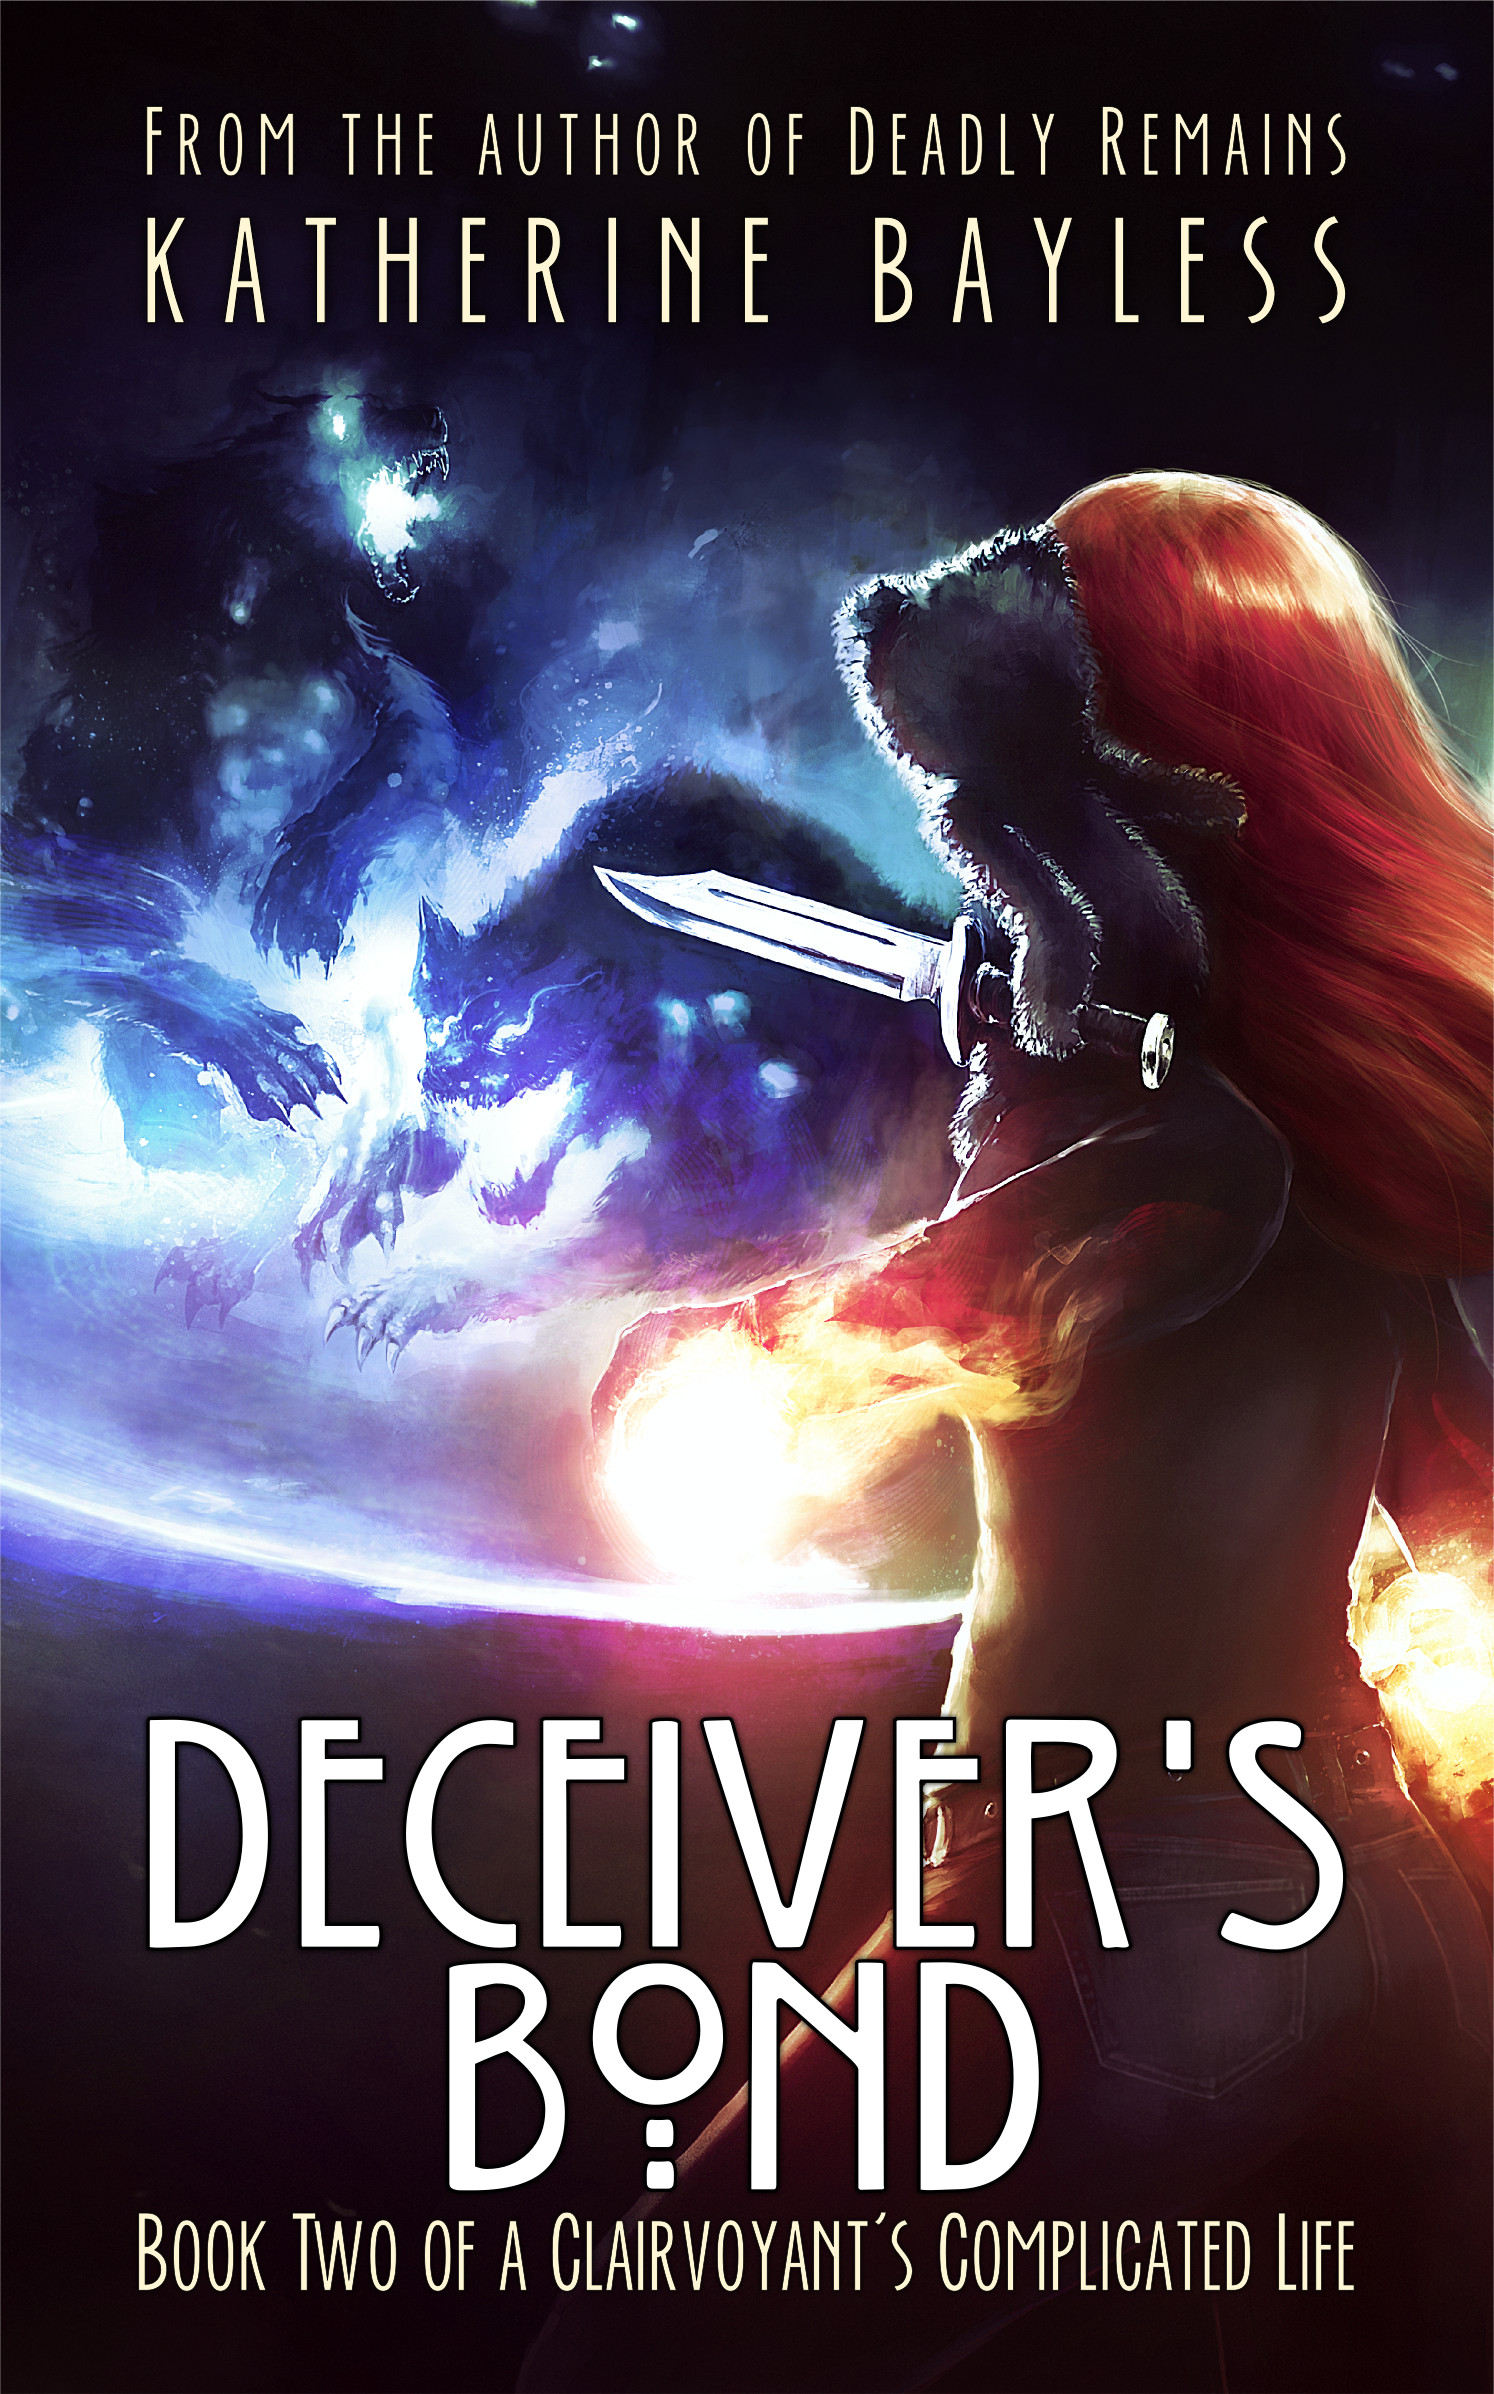 Deceiver's Bond